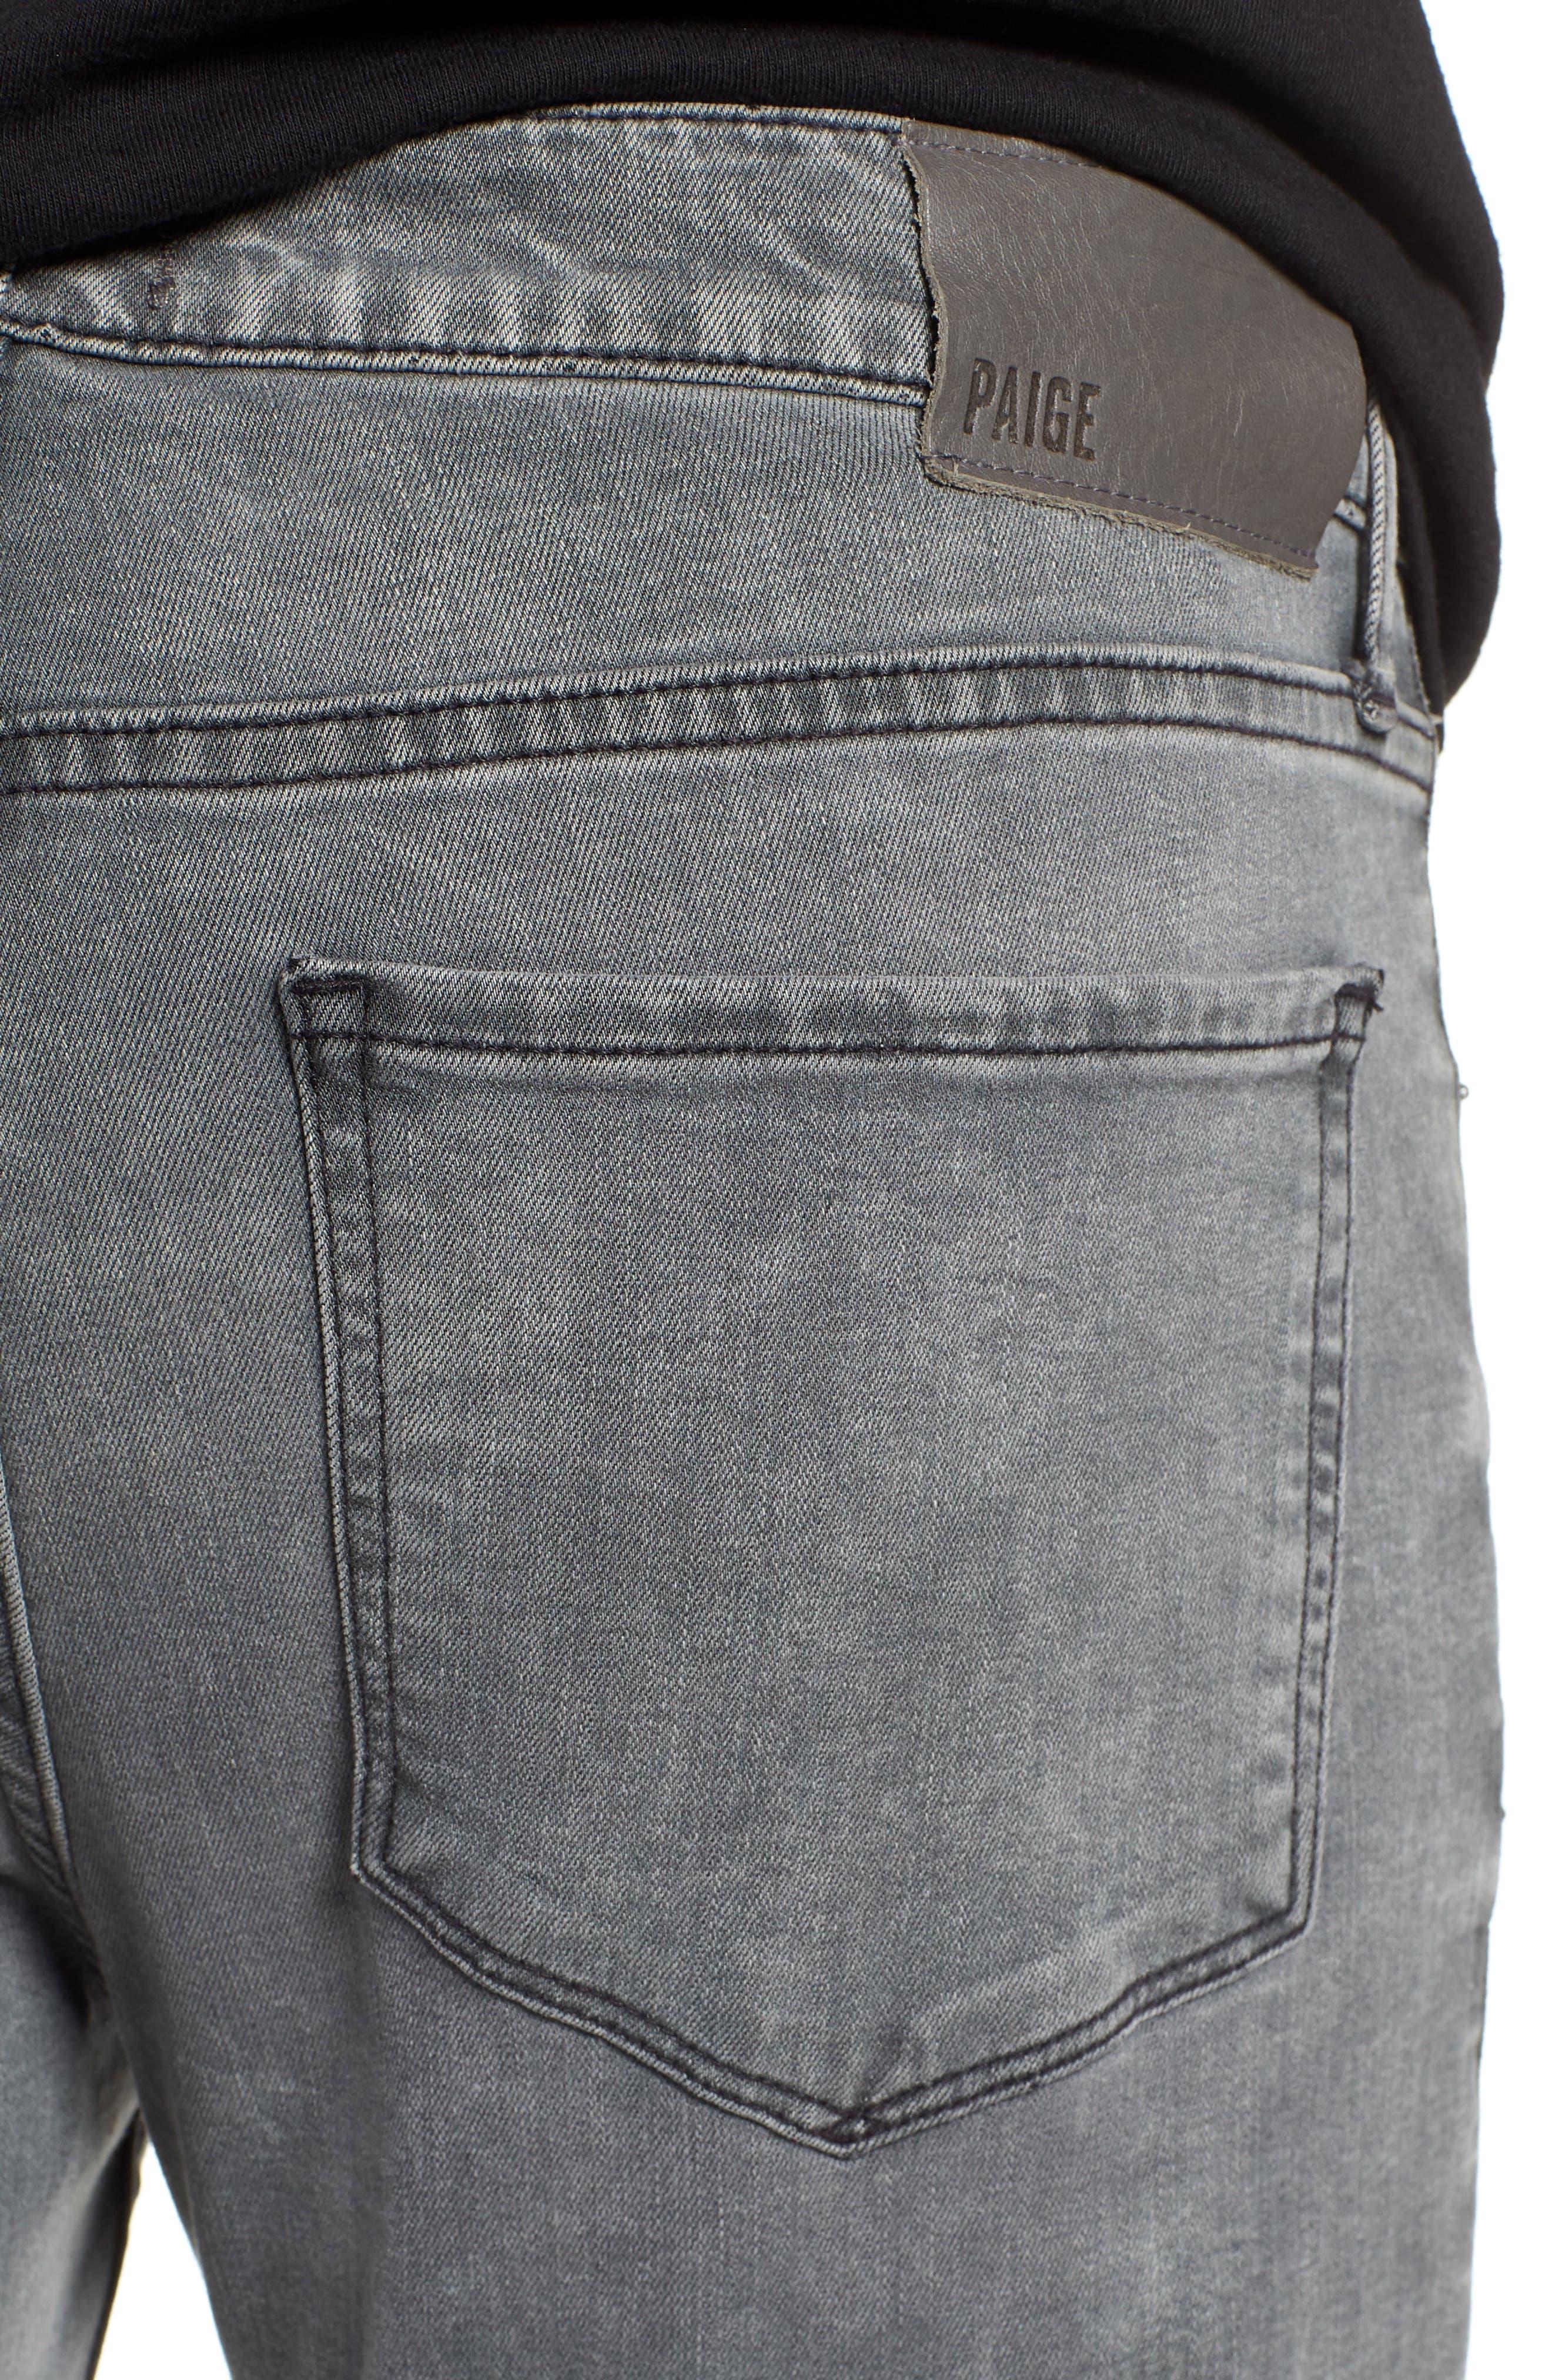 Lennox Slim Fit Jeans,                             Alternate thumbnail 4, color,                             020